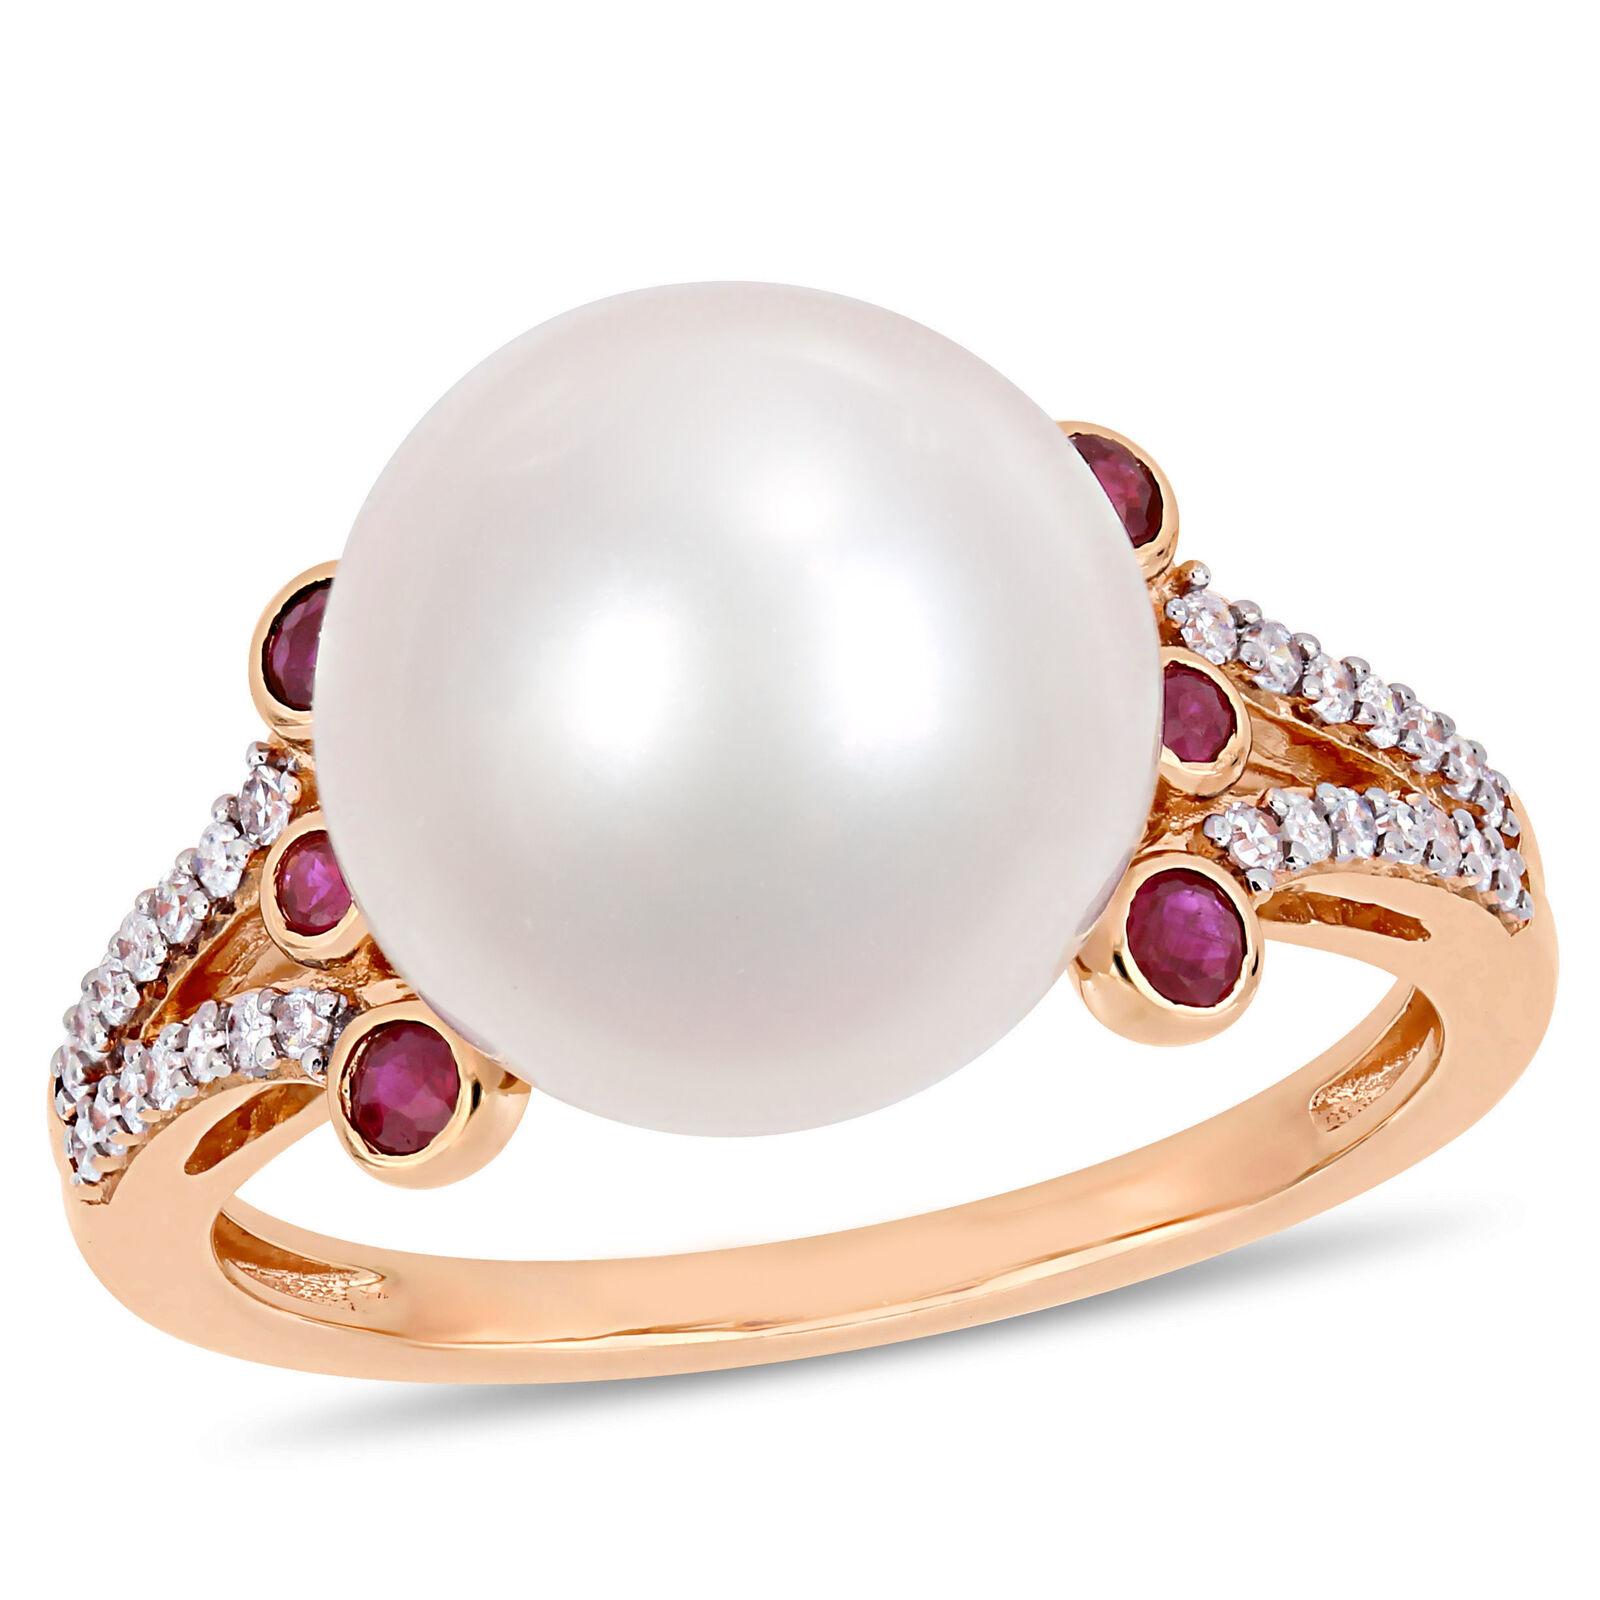 10KR Pearl Diamond Ruby Ring